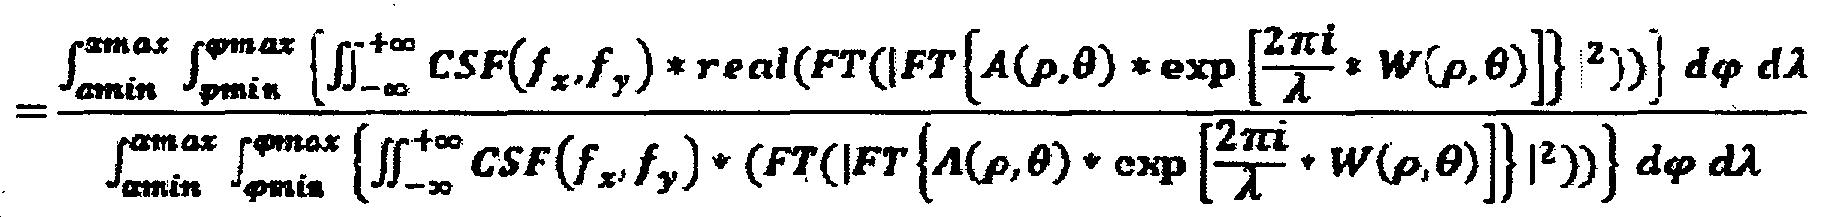 Figure 112014105016158-pct00004